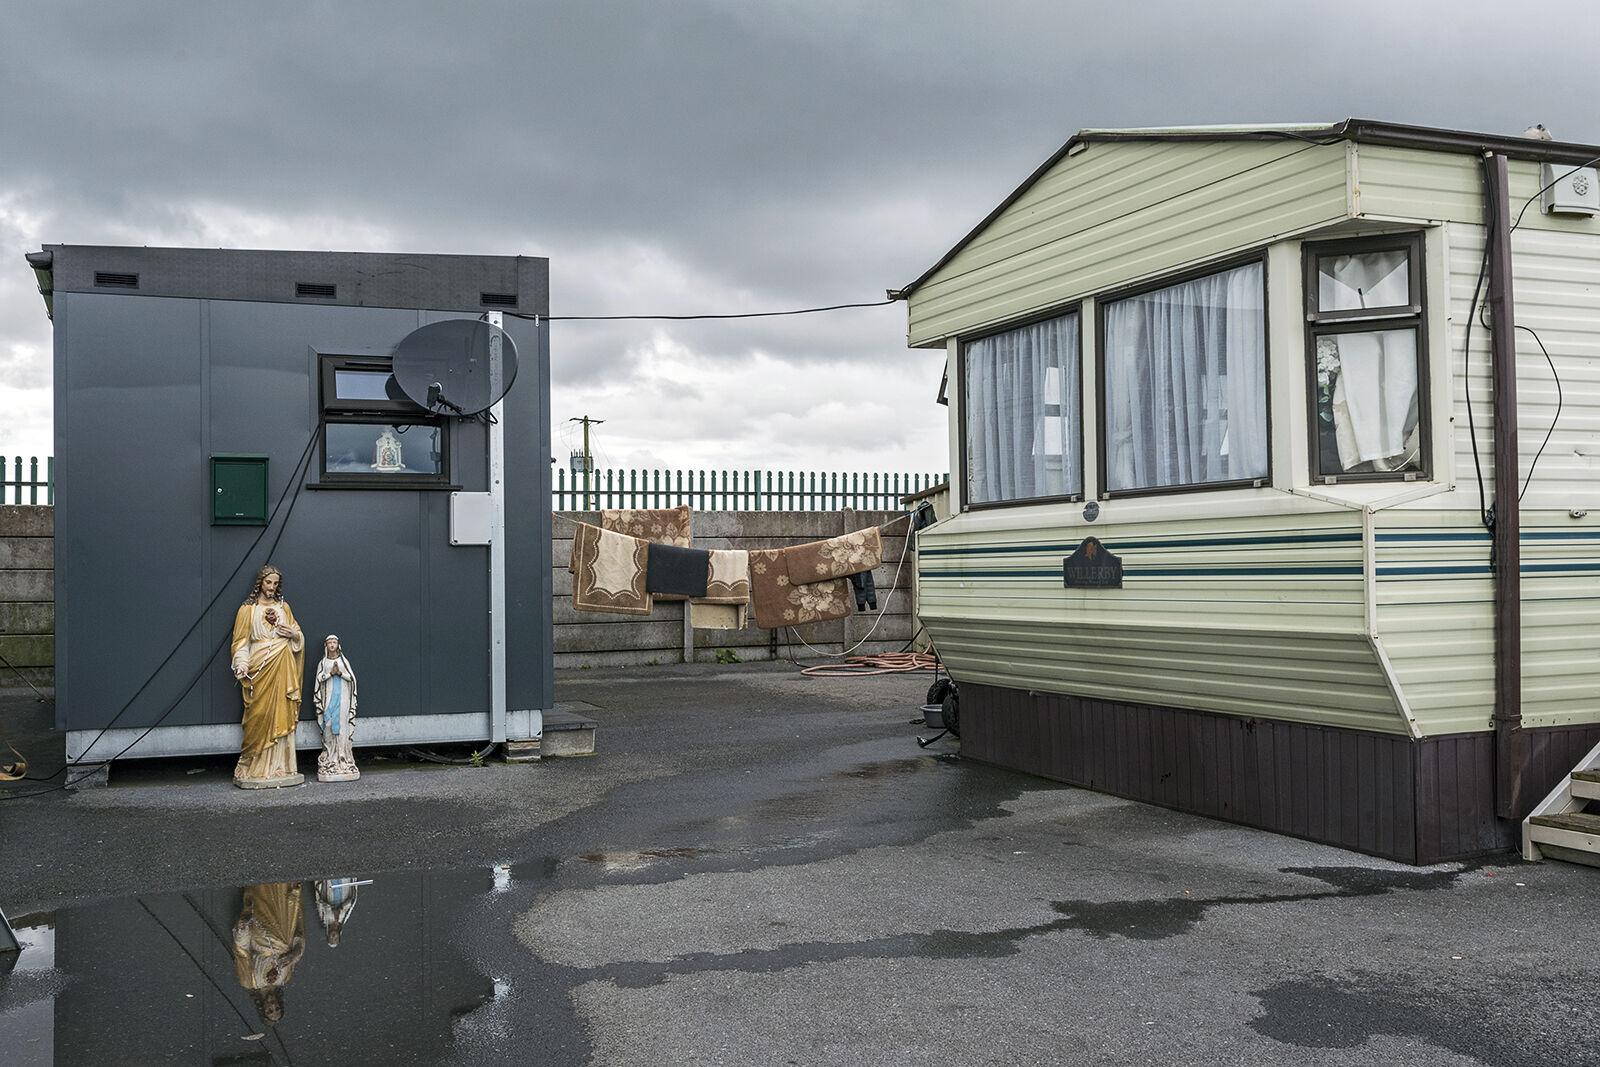 Delaneys Home, Galway, Ireland 2020